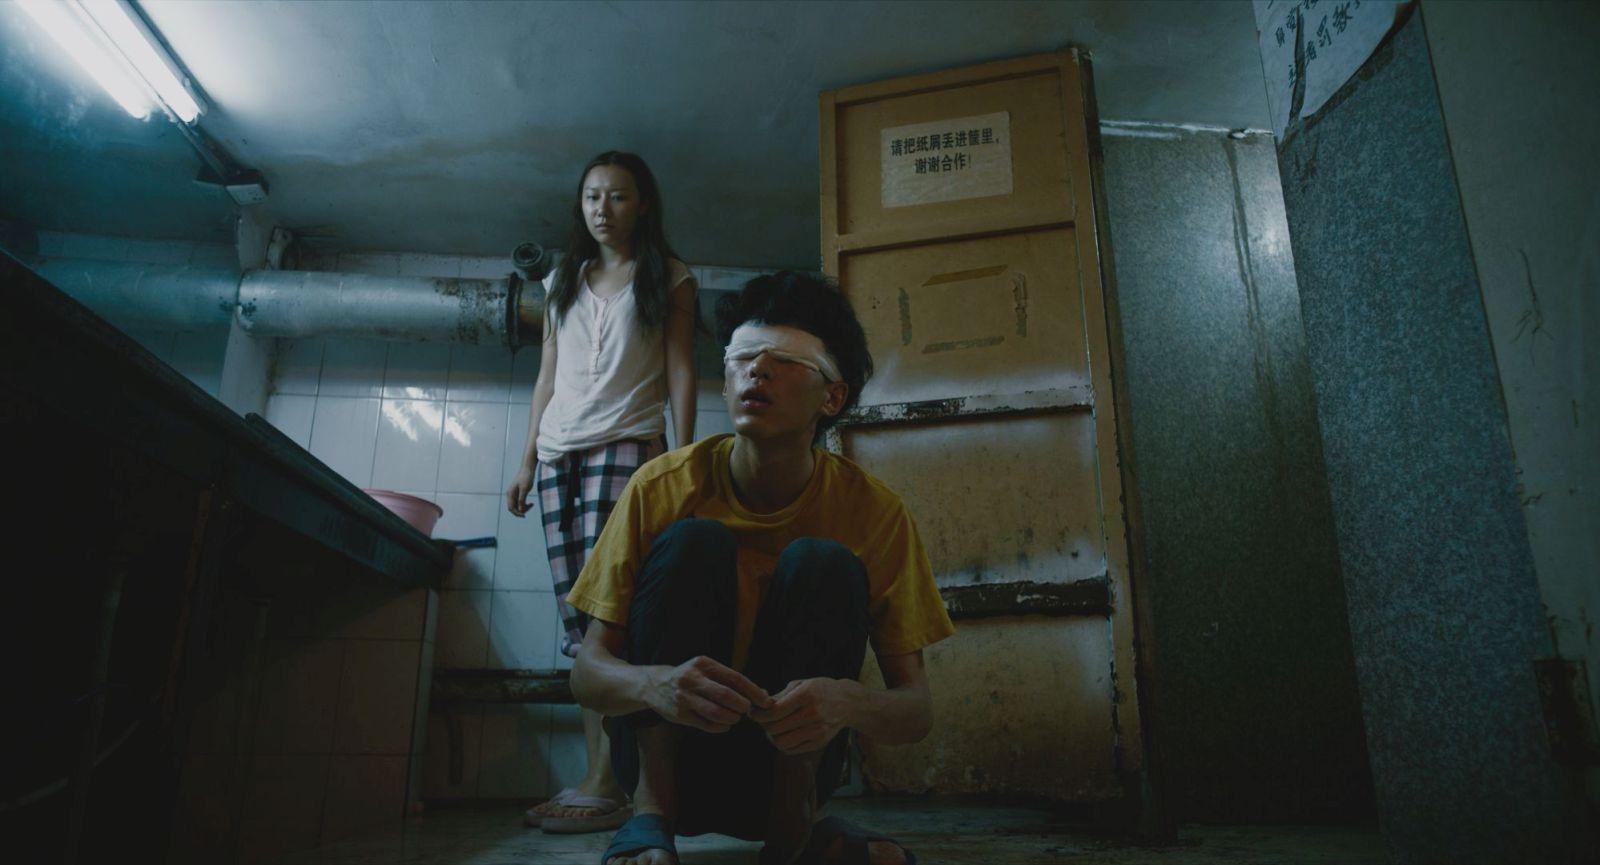 Underground Fragrance: un'inquietante immagine tratta dal film